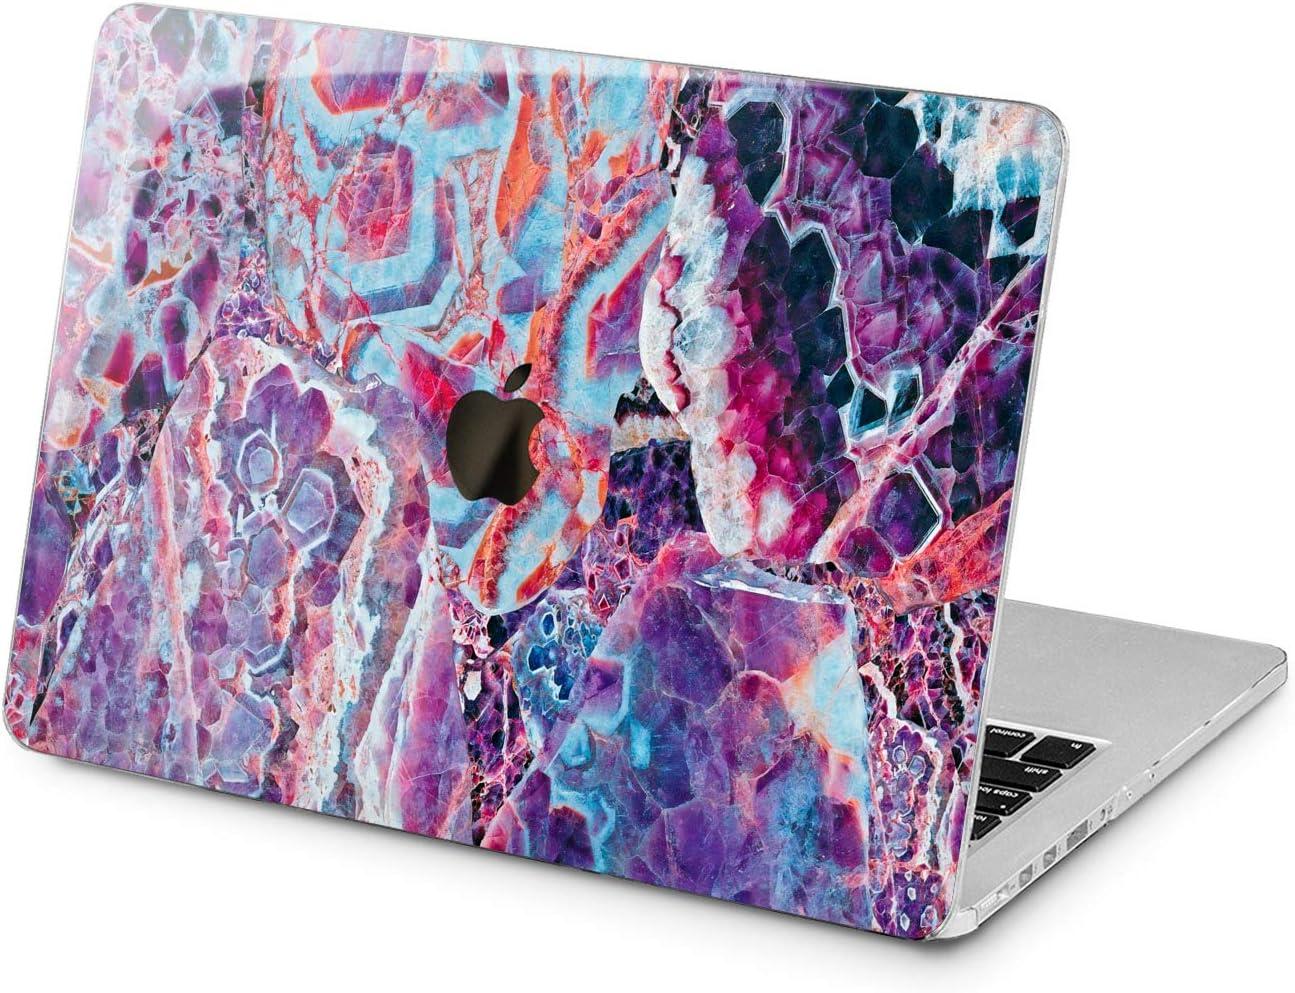 "Cavka Hard Shell Case for Apple MacBook Pro 13"" 2019 15"" 2018 Air 13"" 2020 Retina 2015 Mac 11"" Mac 12"" Purple Crystal Beautiful Print Amethyst Laptop Texture Protective Design Trendy Cover Plastic"